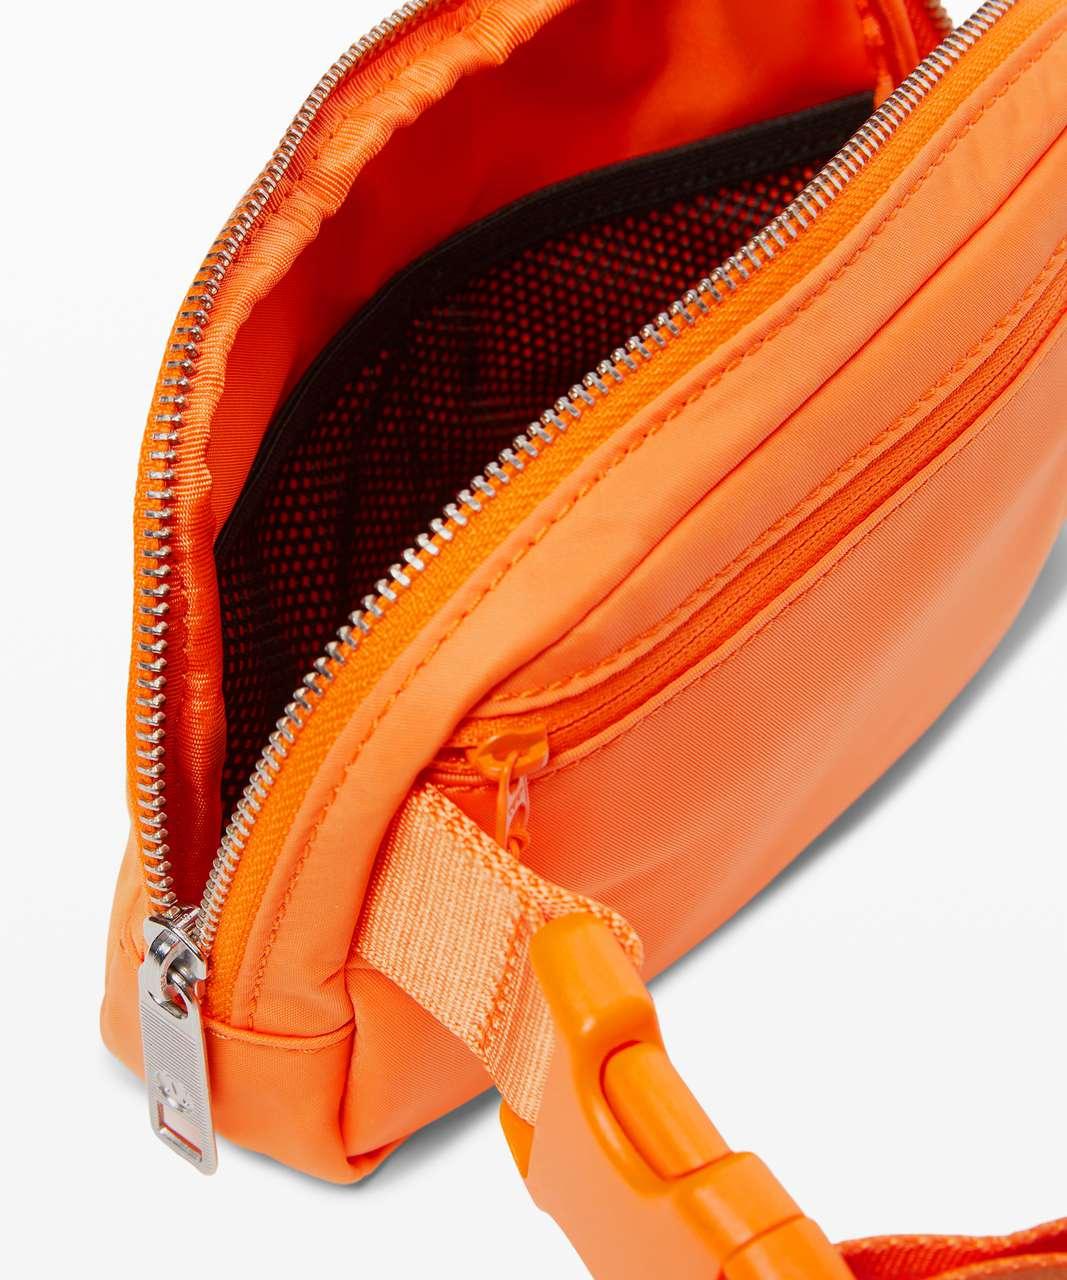 Lululemon Everywhere Belt Bag *1L - Tiger